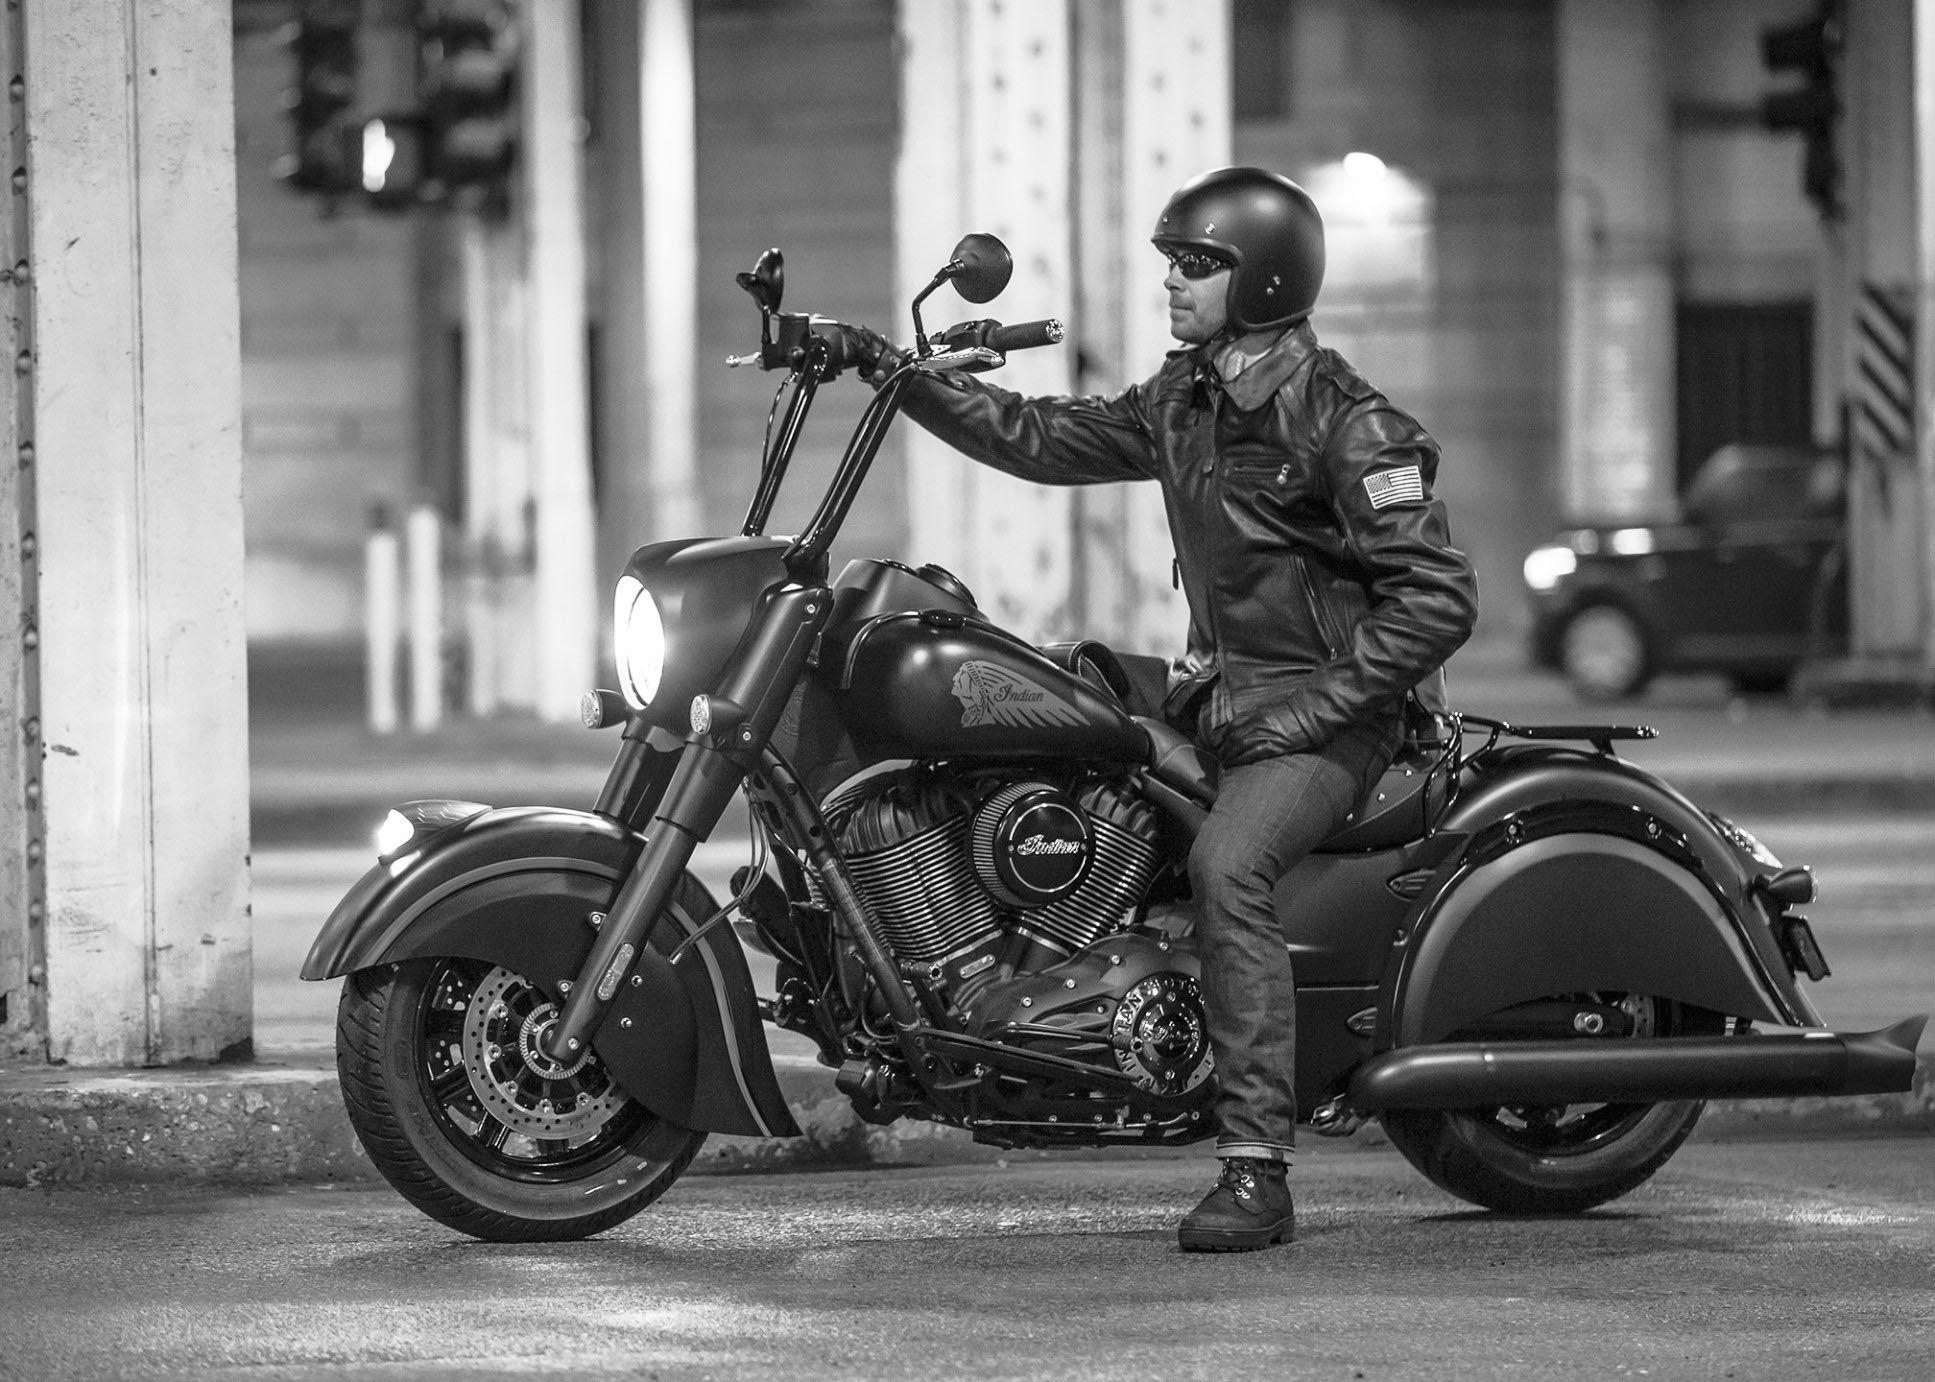 2016 indian chief dark horse hd wallpaper motorcycles hd wallpaper pinterest. Black Bedroom Furniture Sets. Home Design Ideas